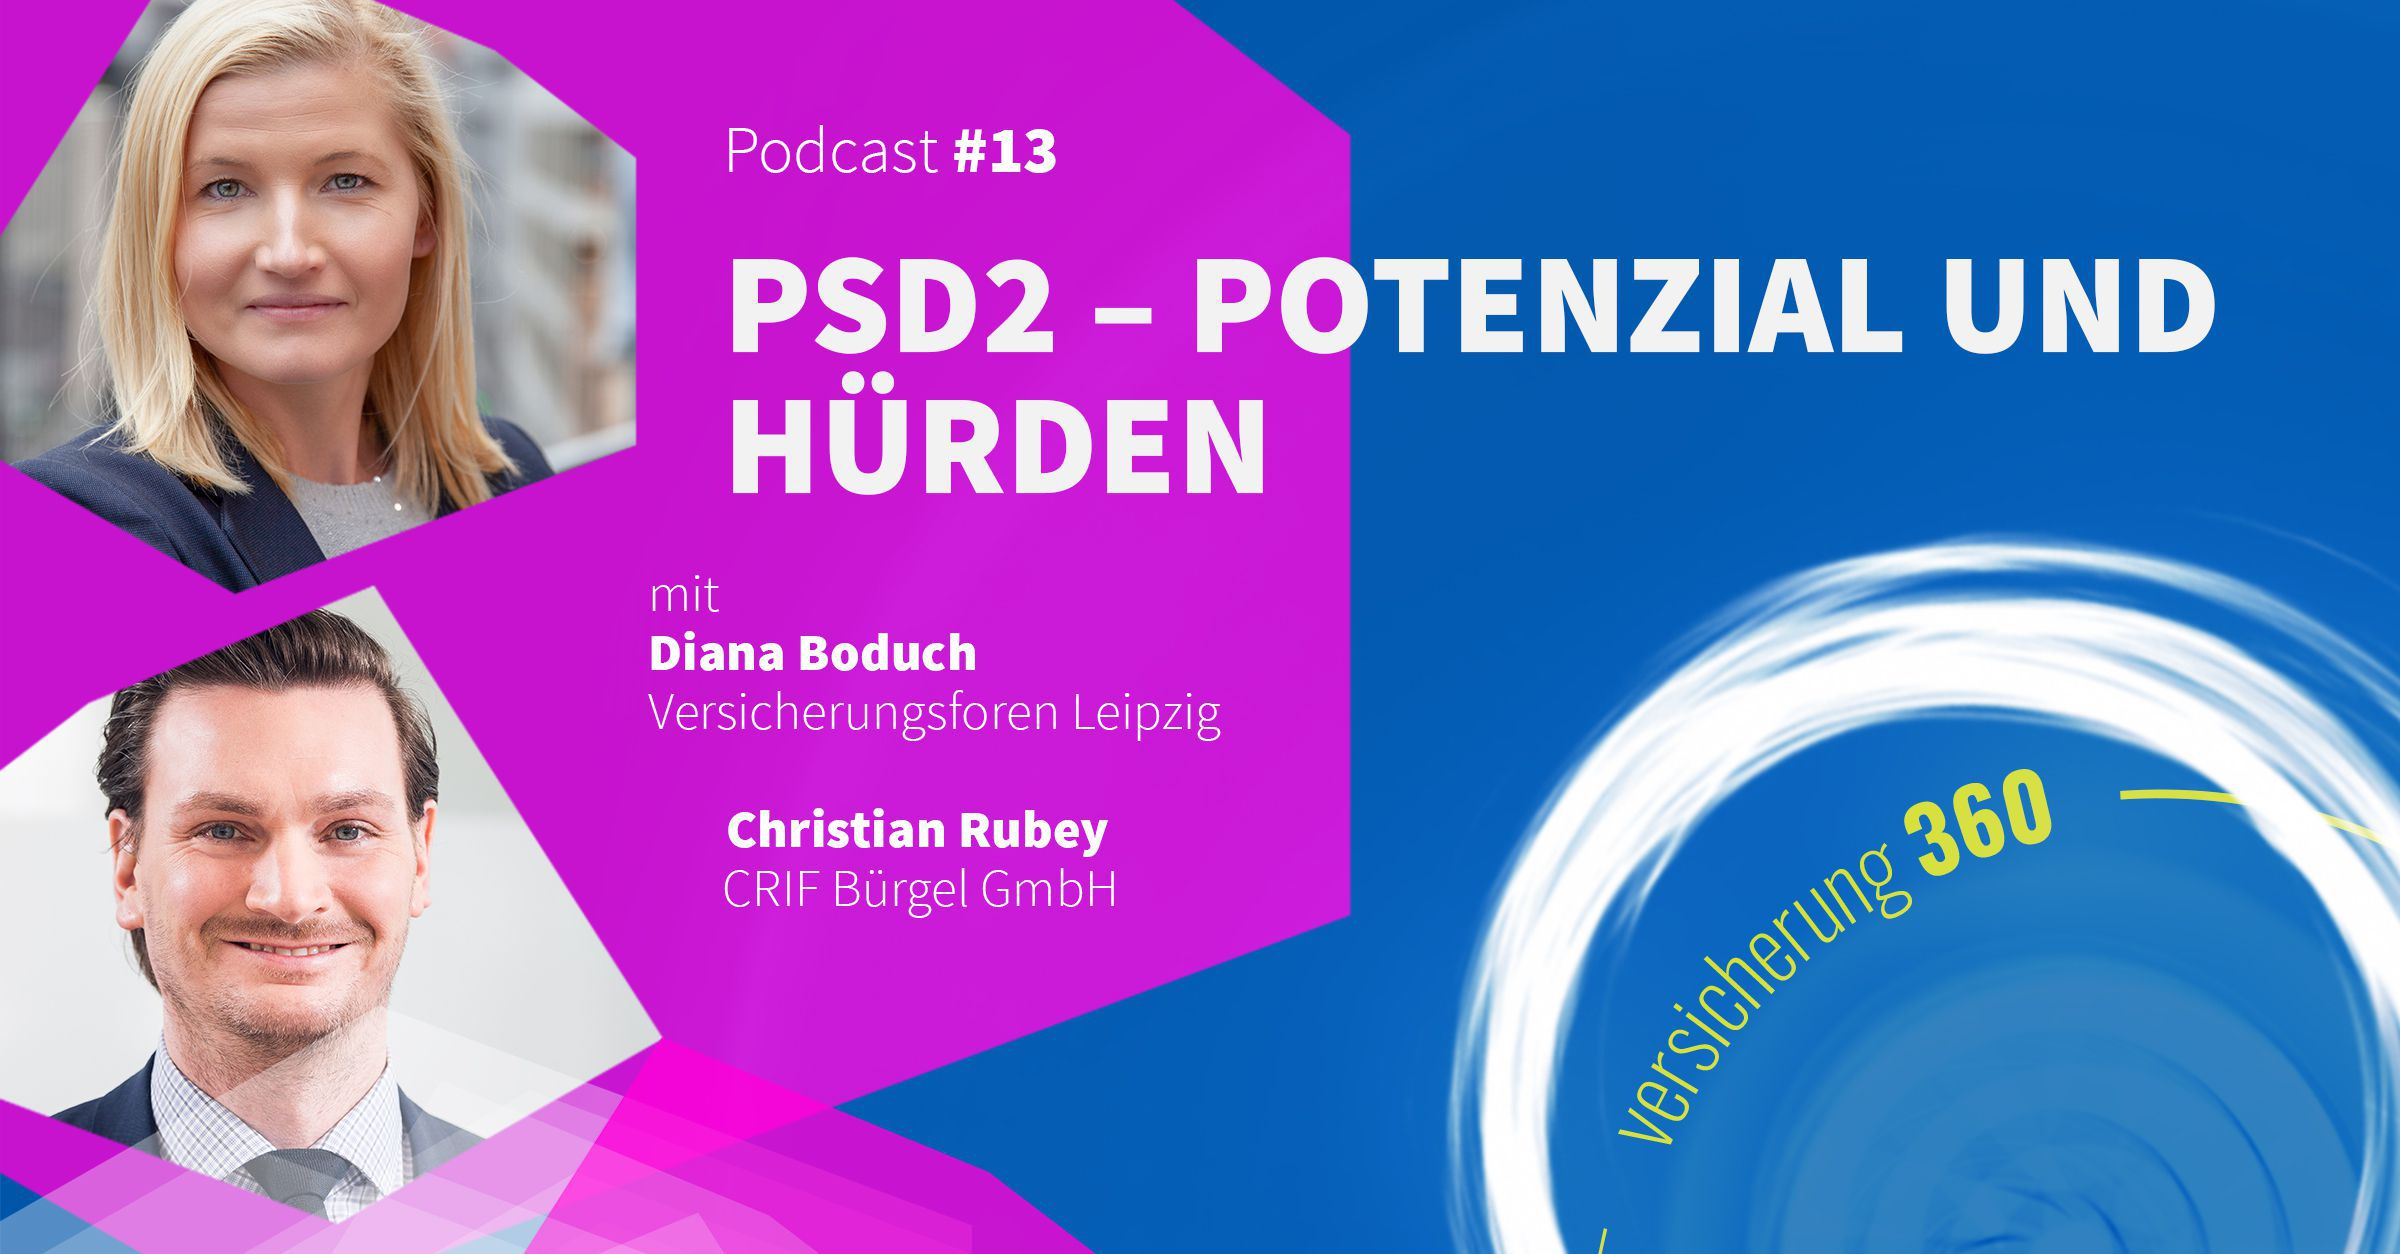 Podcast #13: PSD2 - Potenzial und Hürden